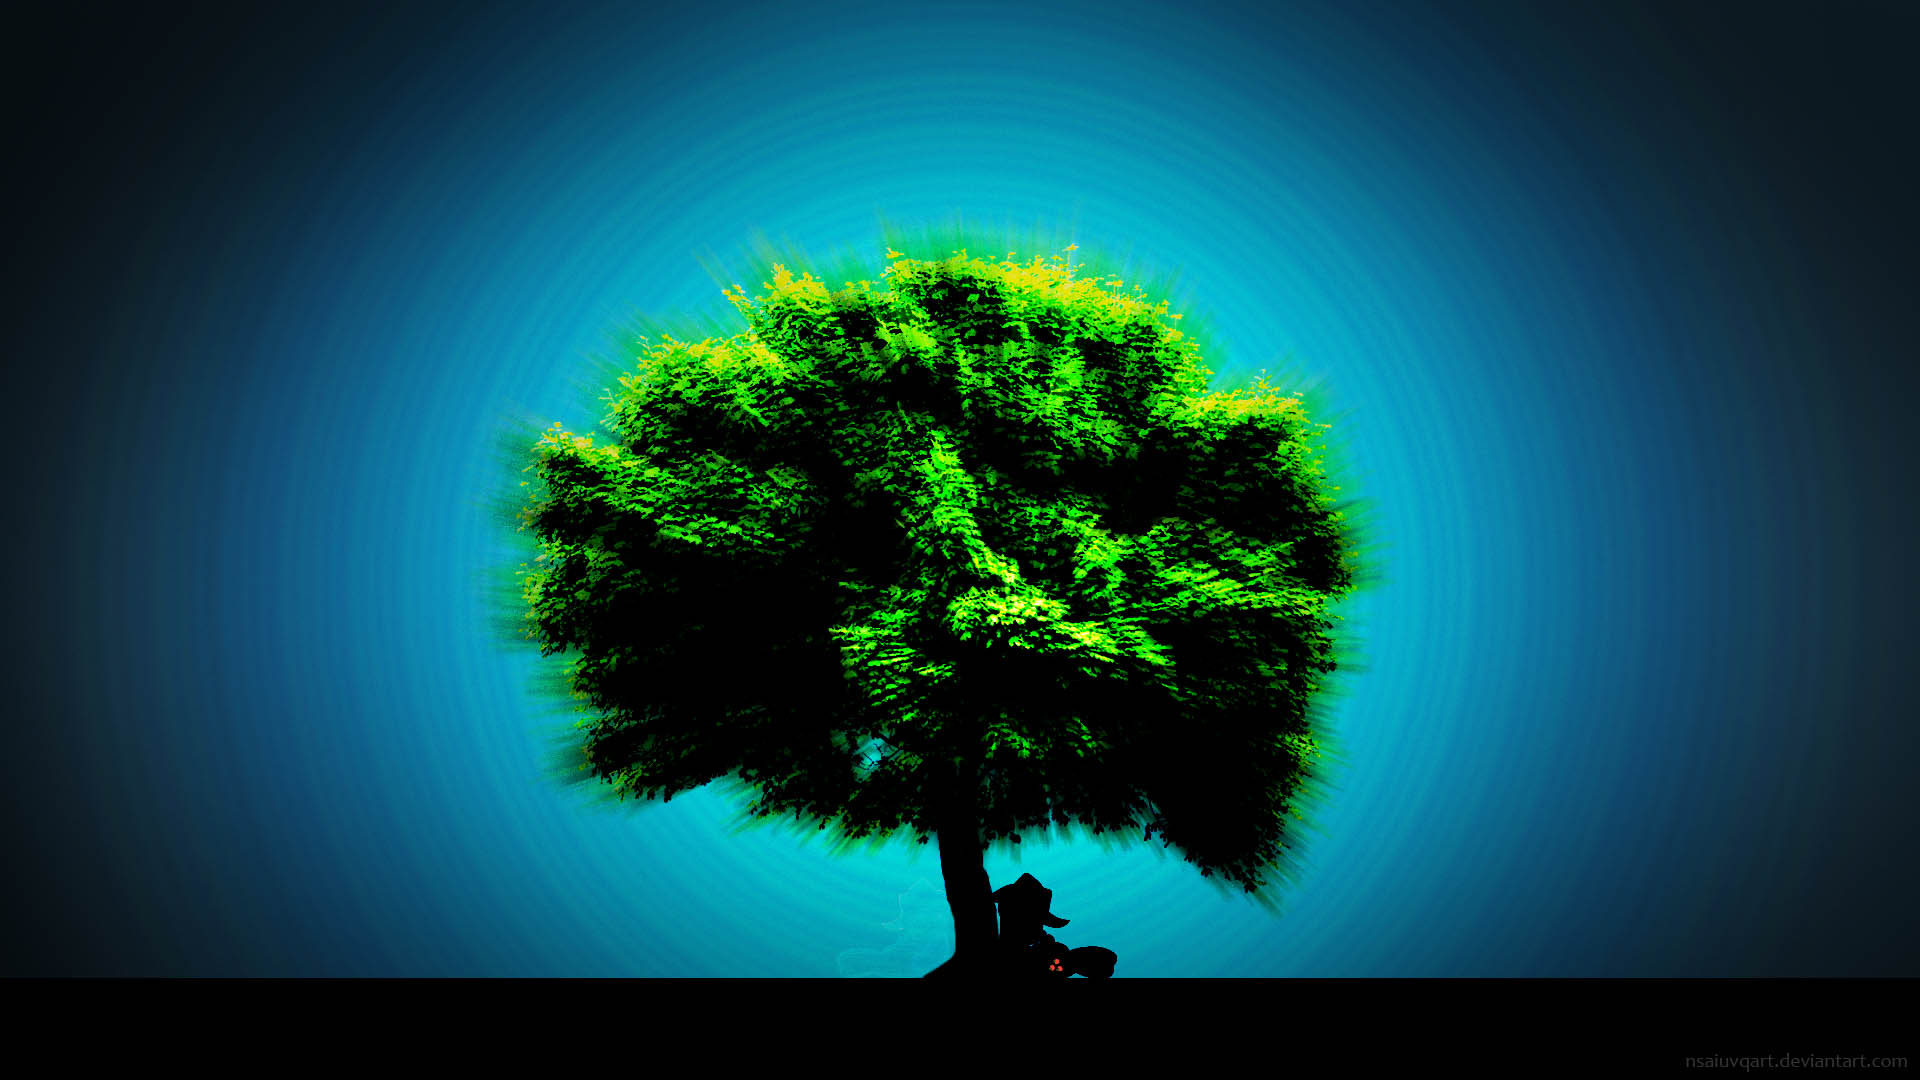 Home Wallpaper Life: Tree Of Life Desktop Wallpaper